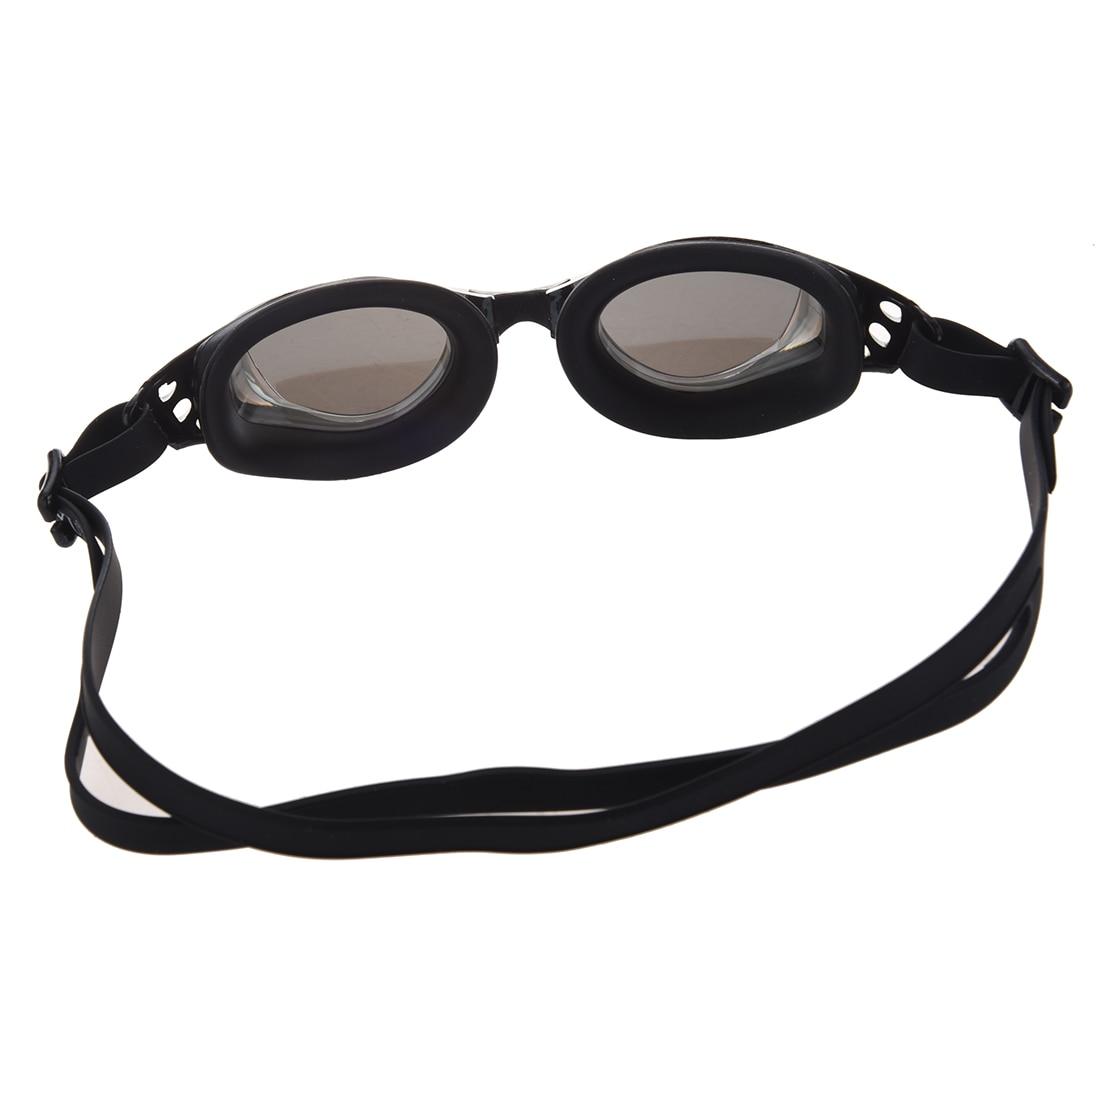 Black Swim Swimming Water Silicone Pool Adult Goggles